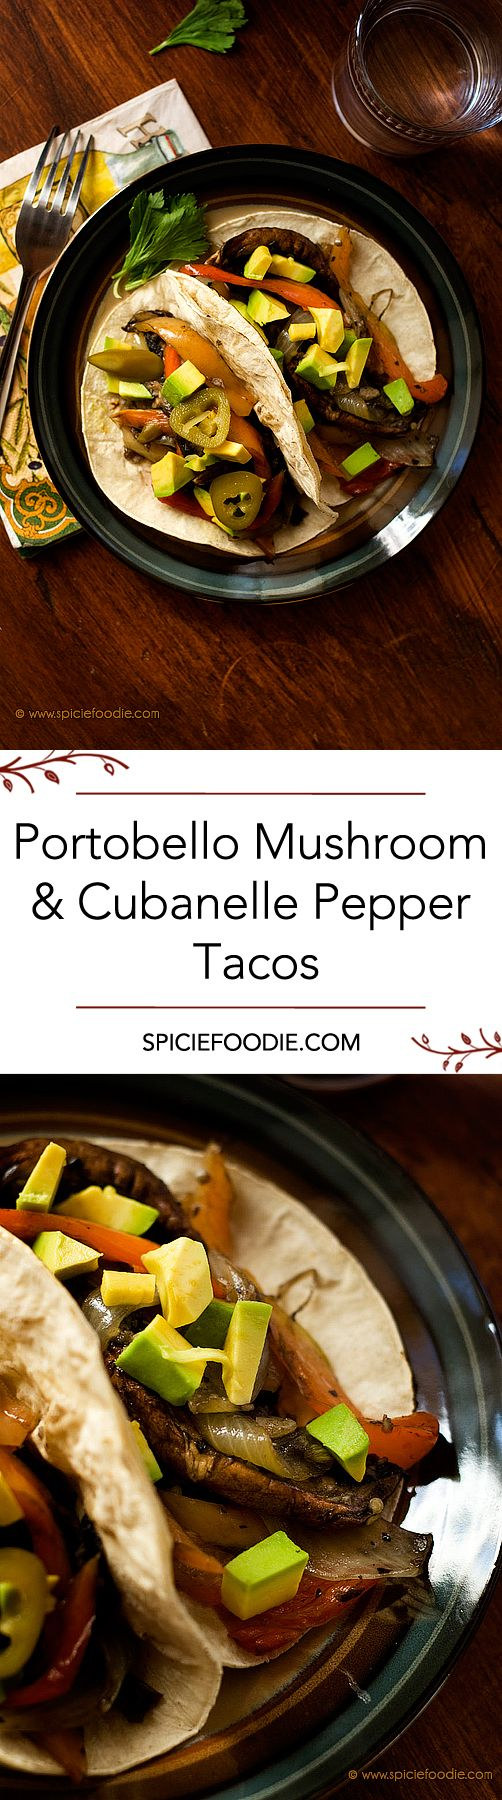 Portobello Mushroom and Cubanelle Pepper Tacos Recipe    #tacos #vegan  #meatlessmonday